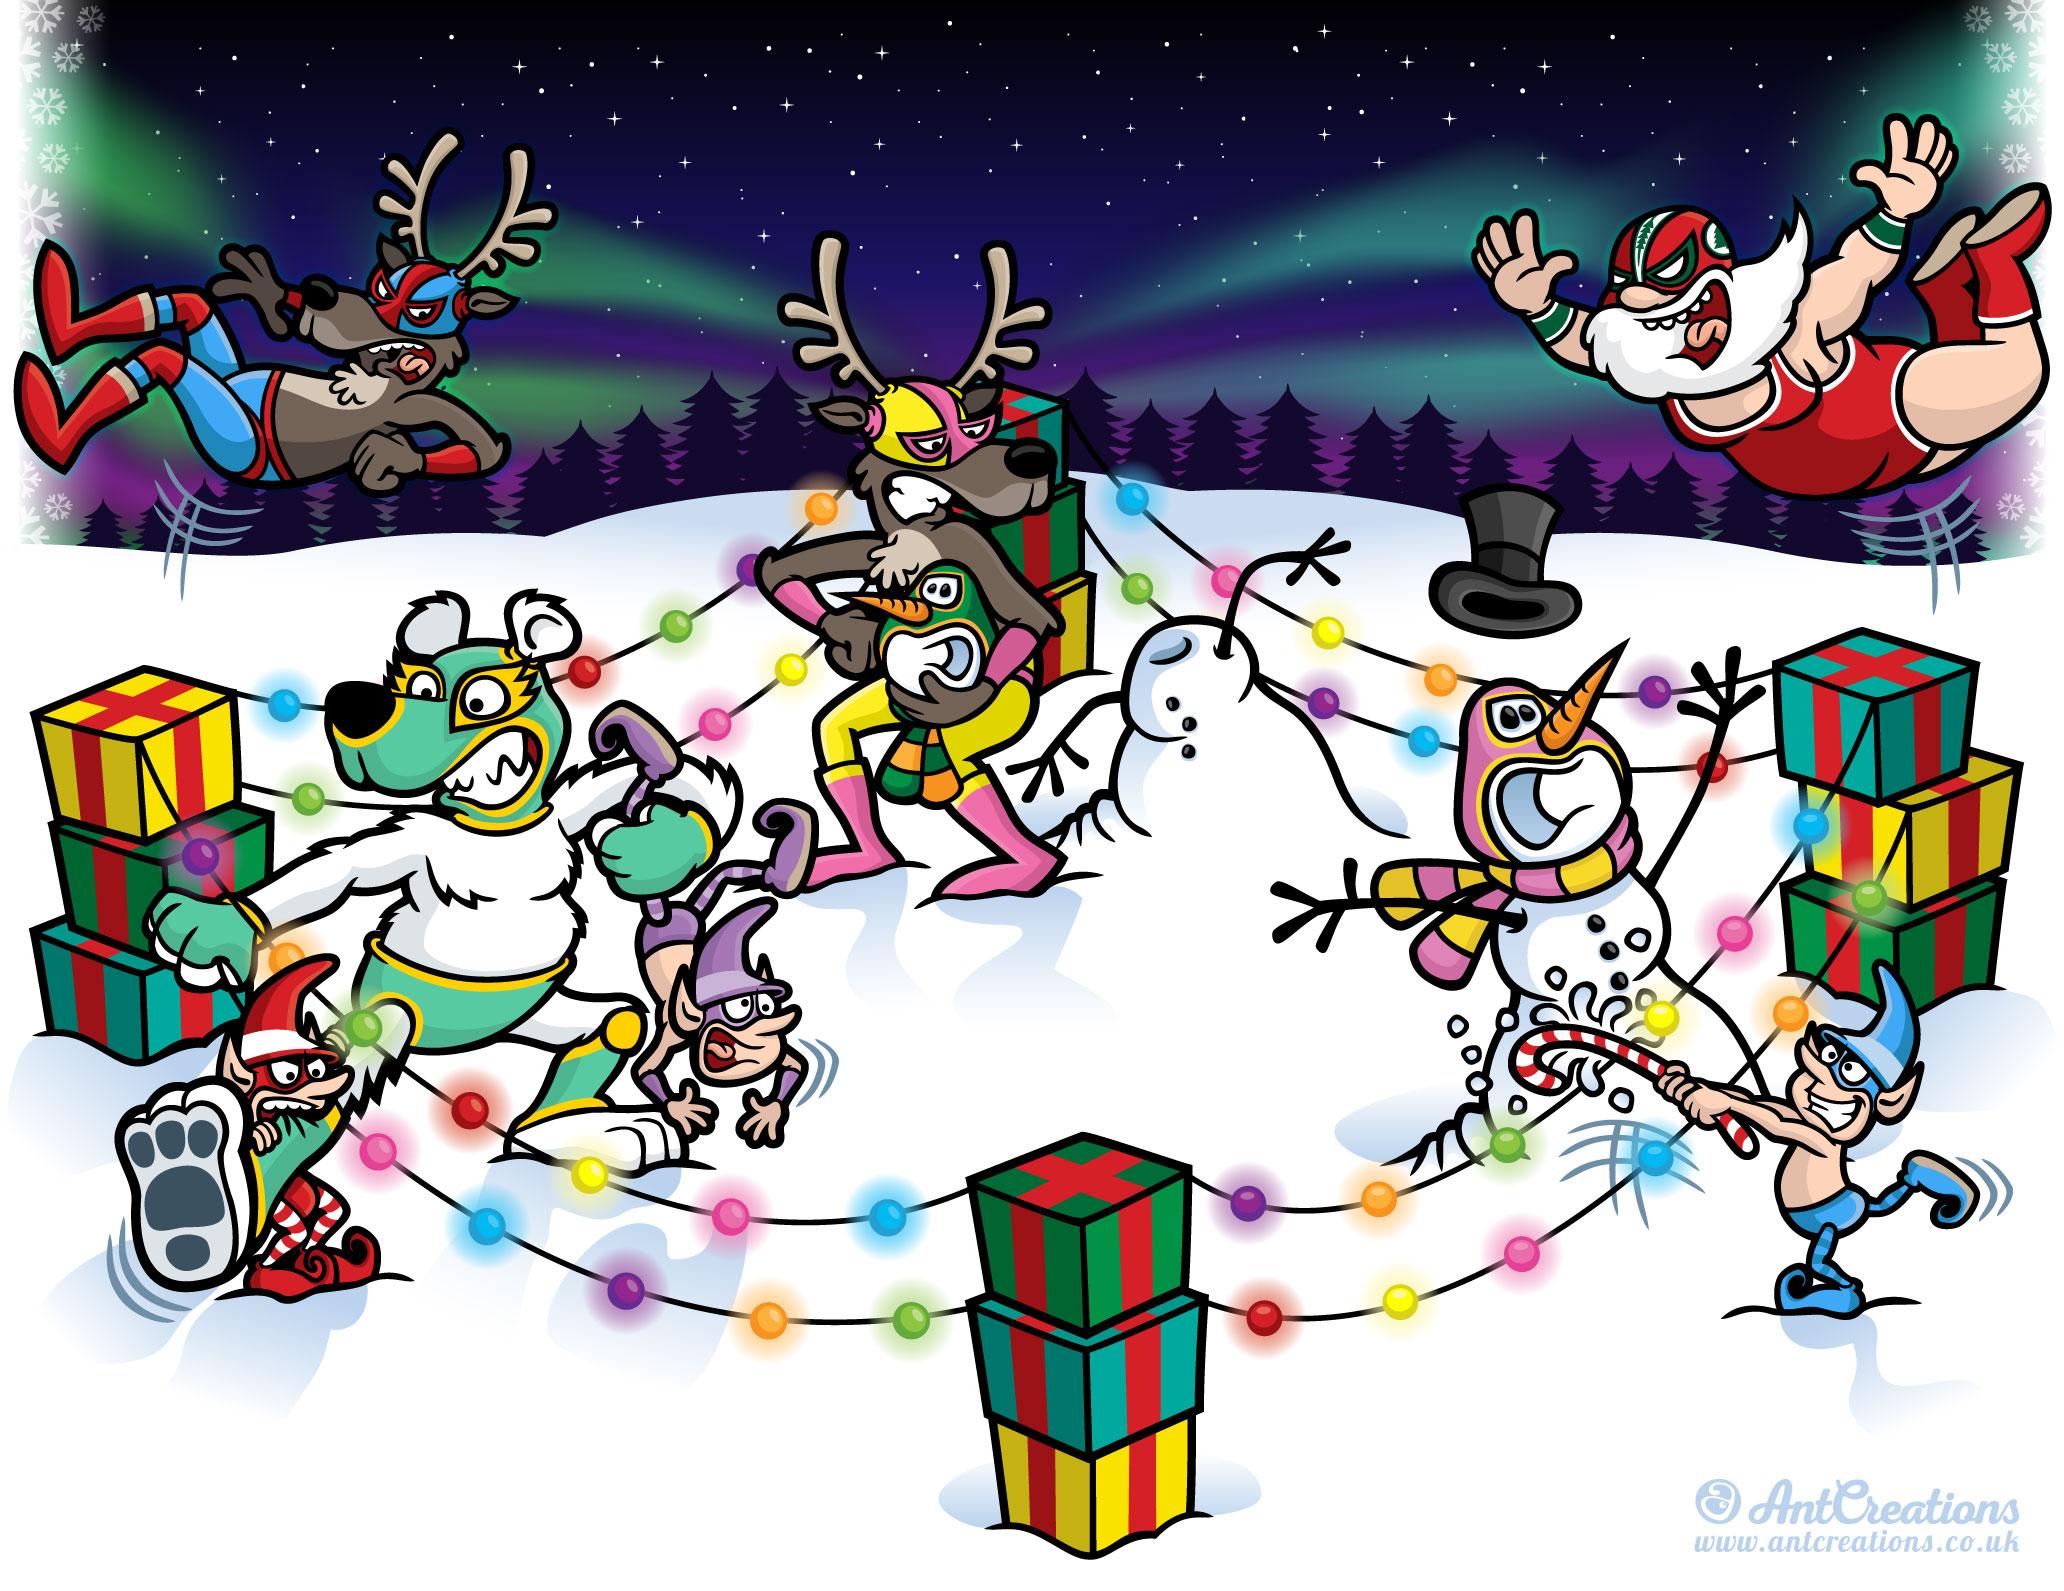 AntCreations-ChristmasLuchadorWrestle.jpg